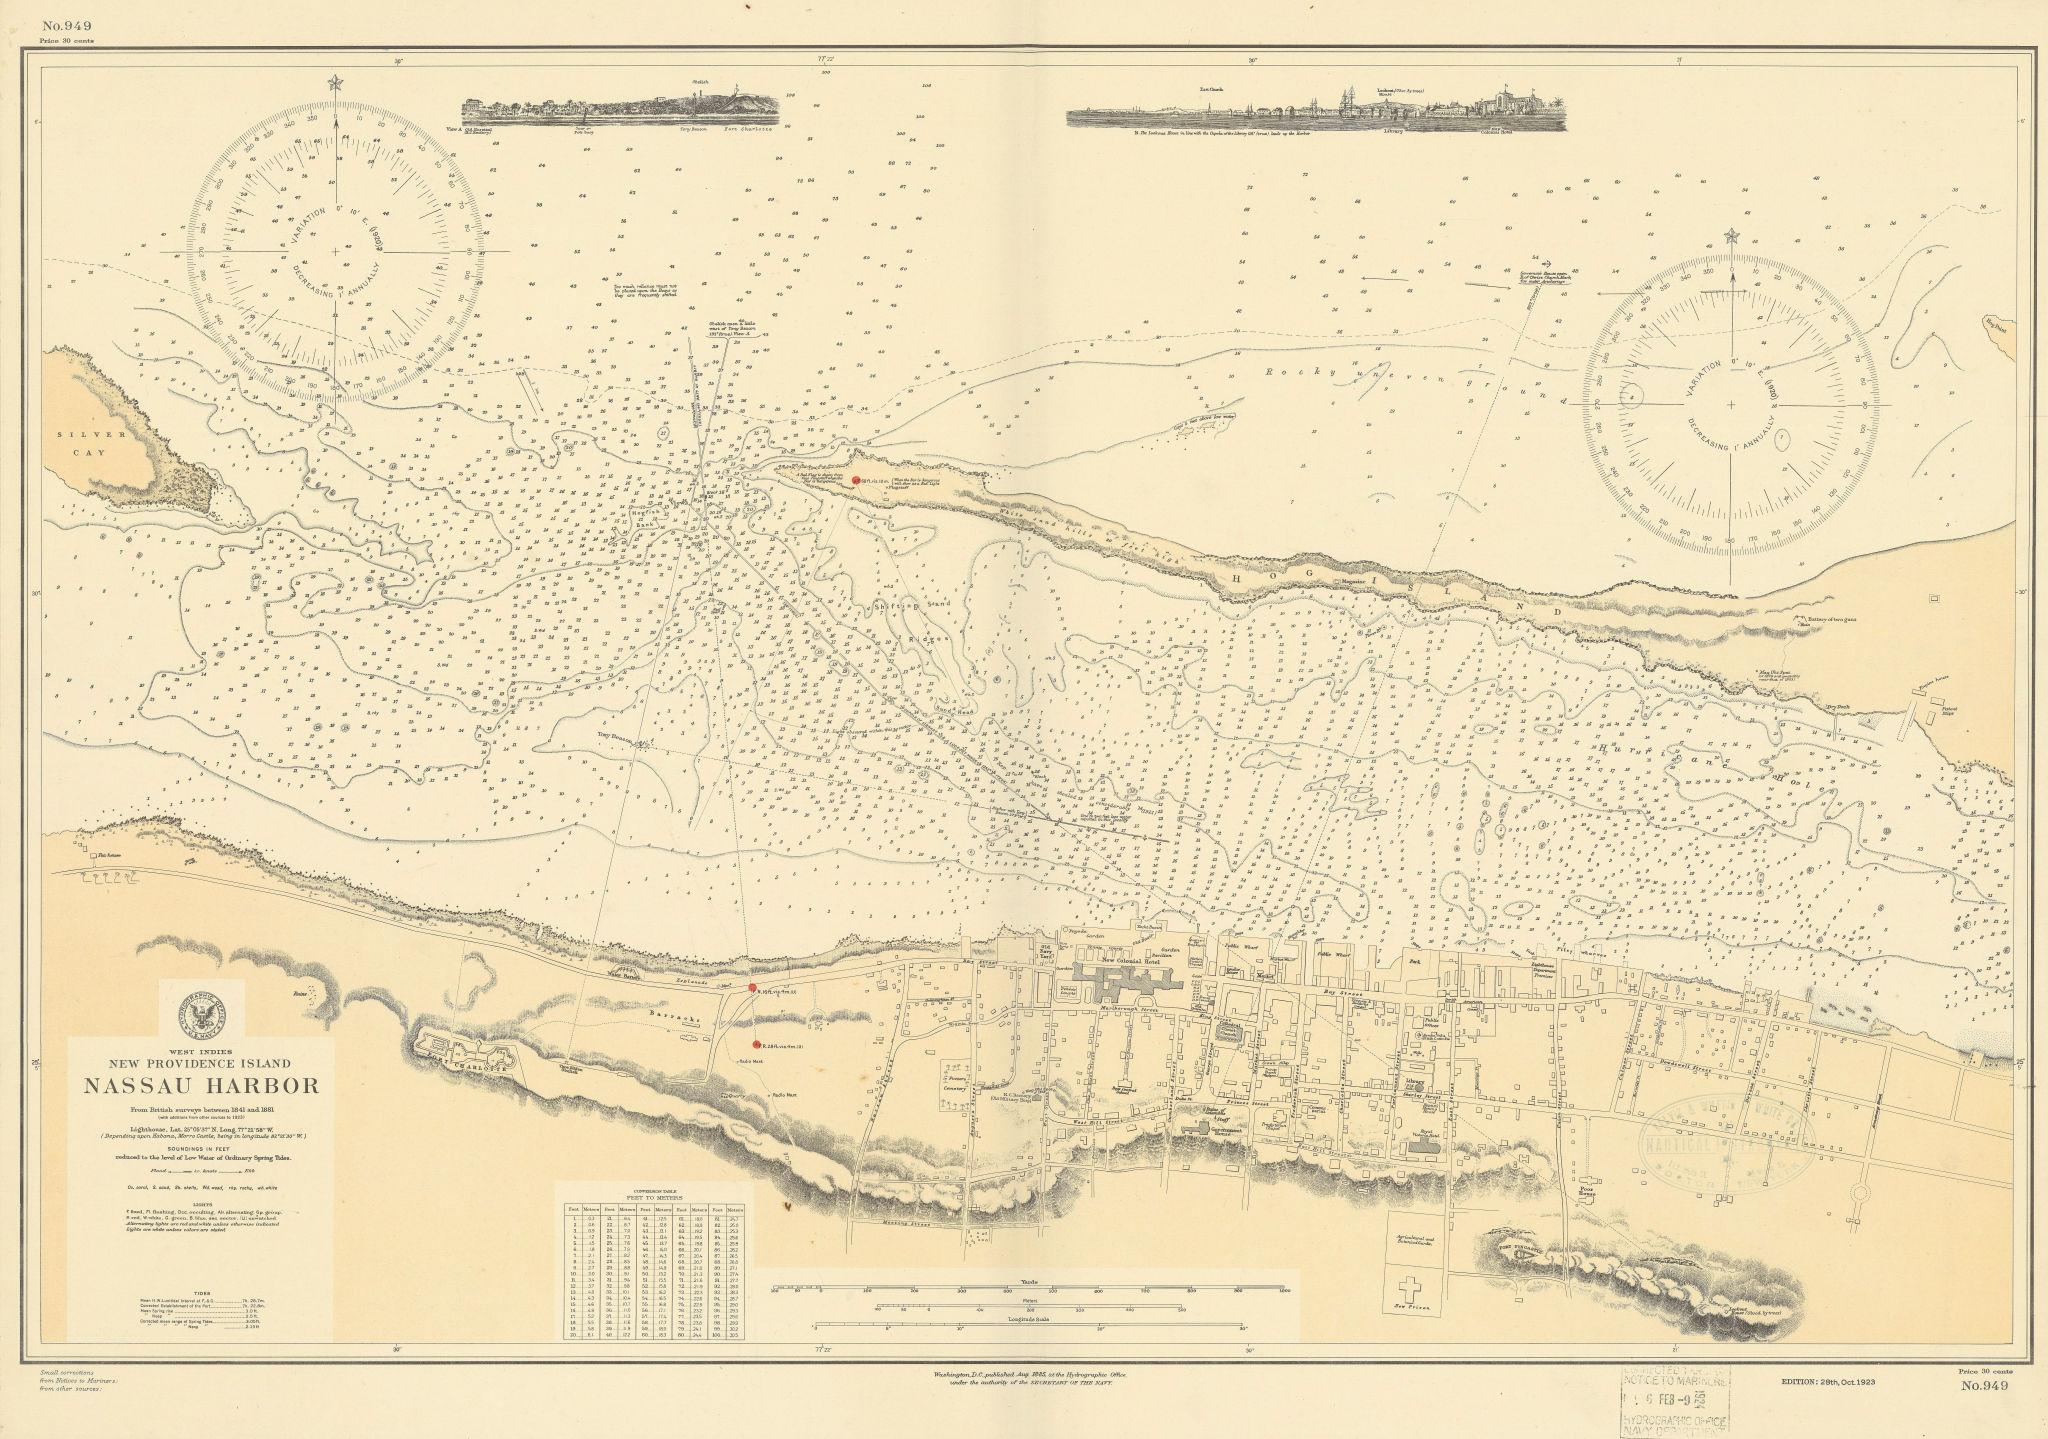 Nassau Harbour New Providence Bahamas US Navy chart town plan 1885 (1924) map